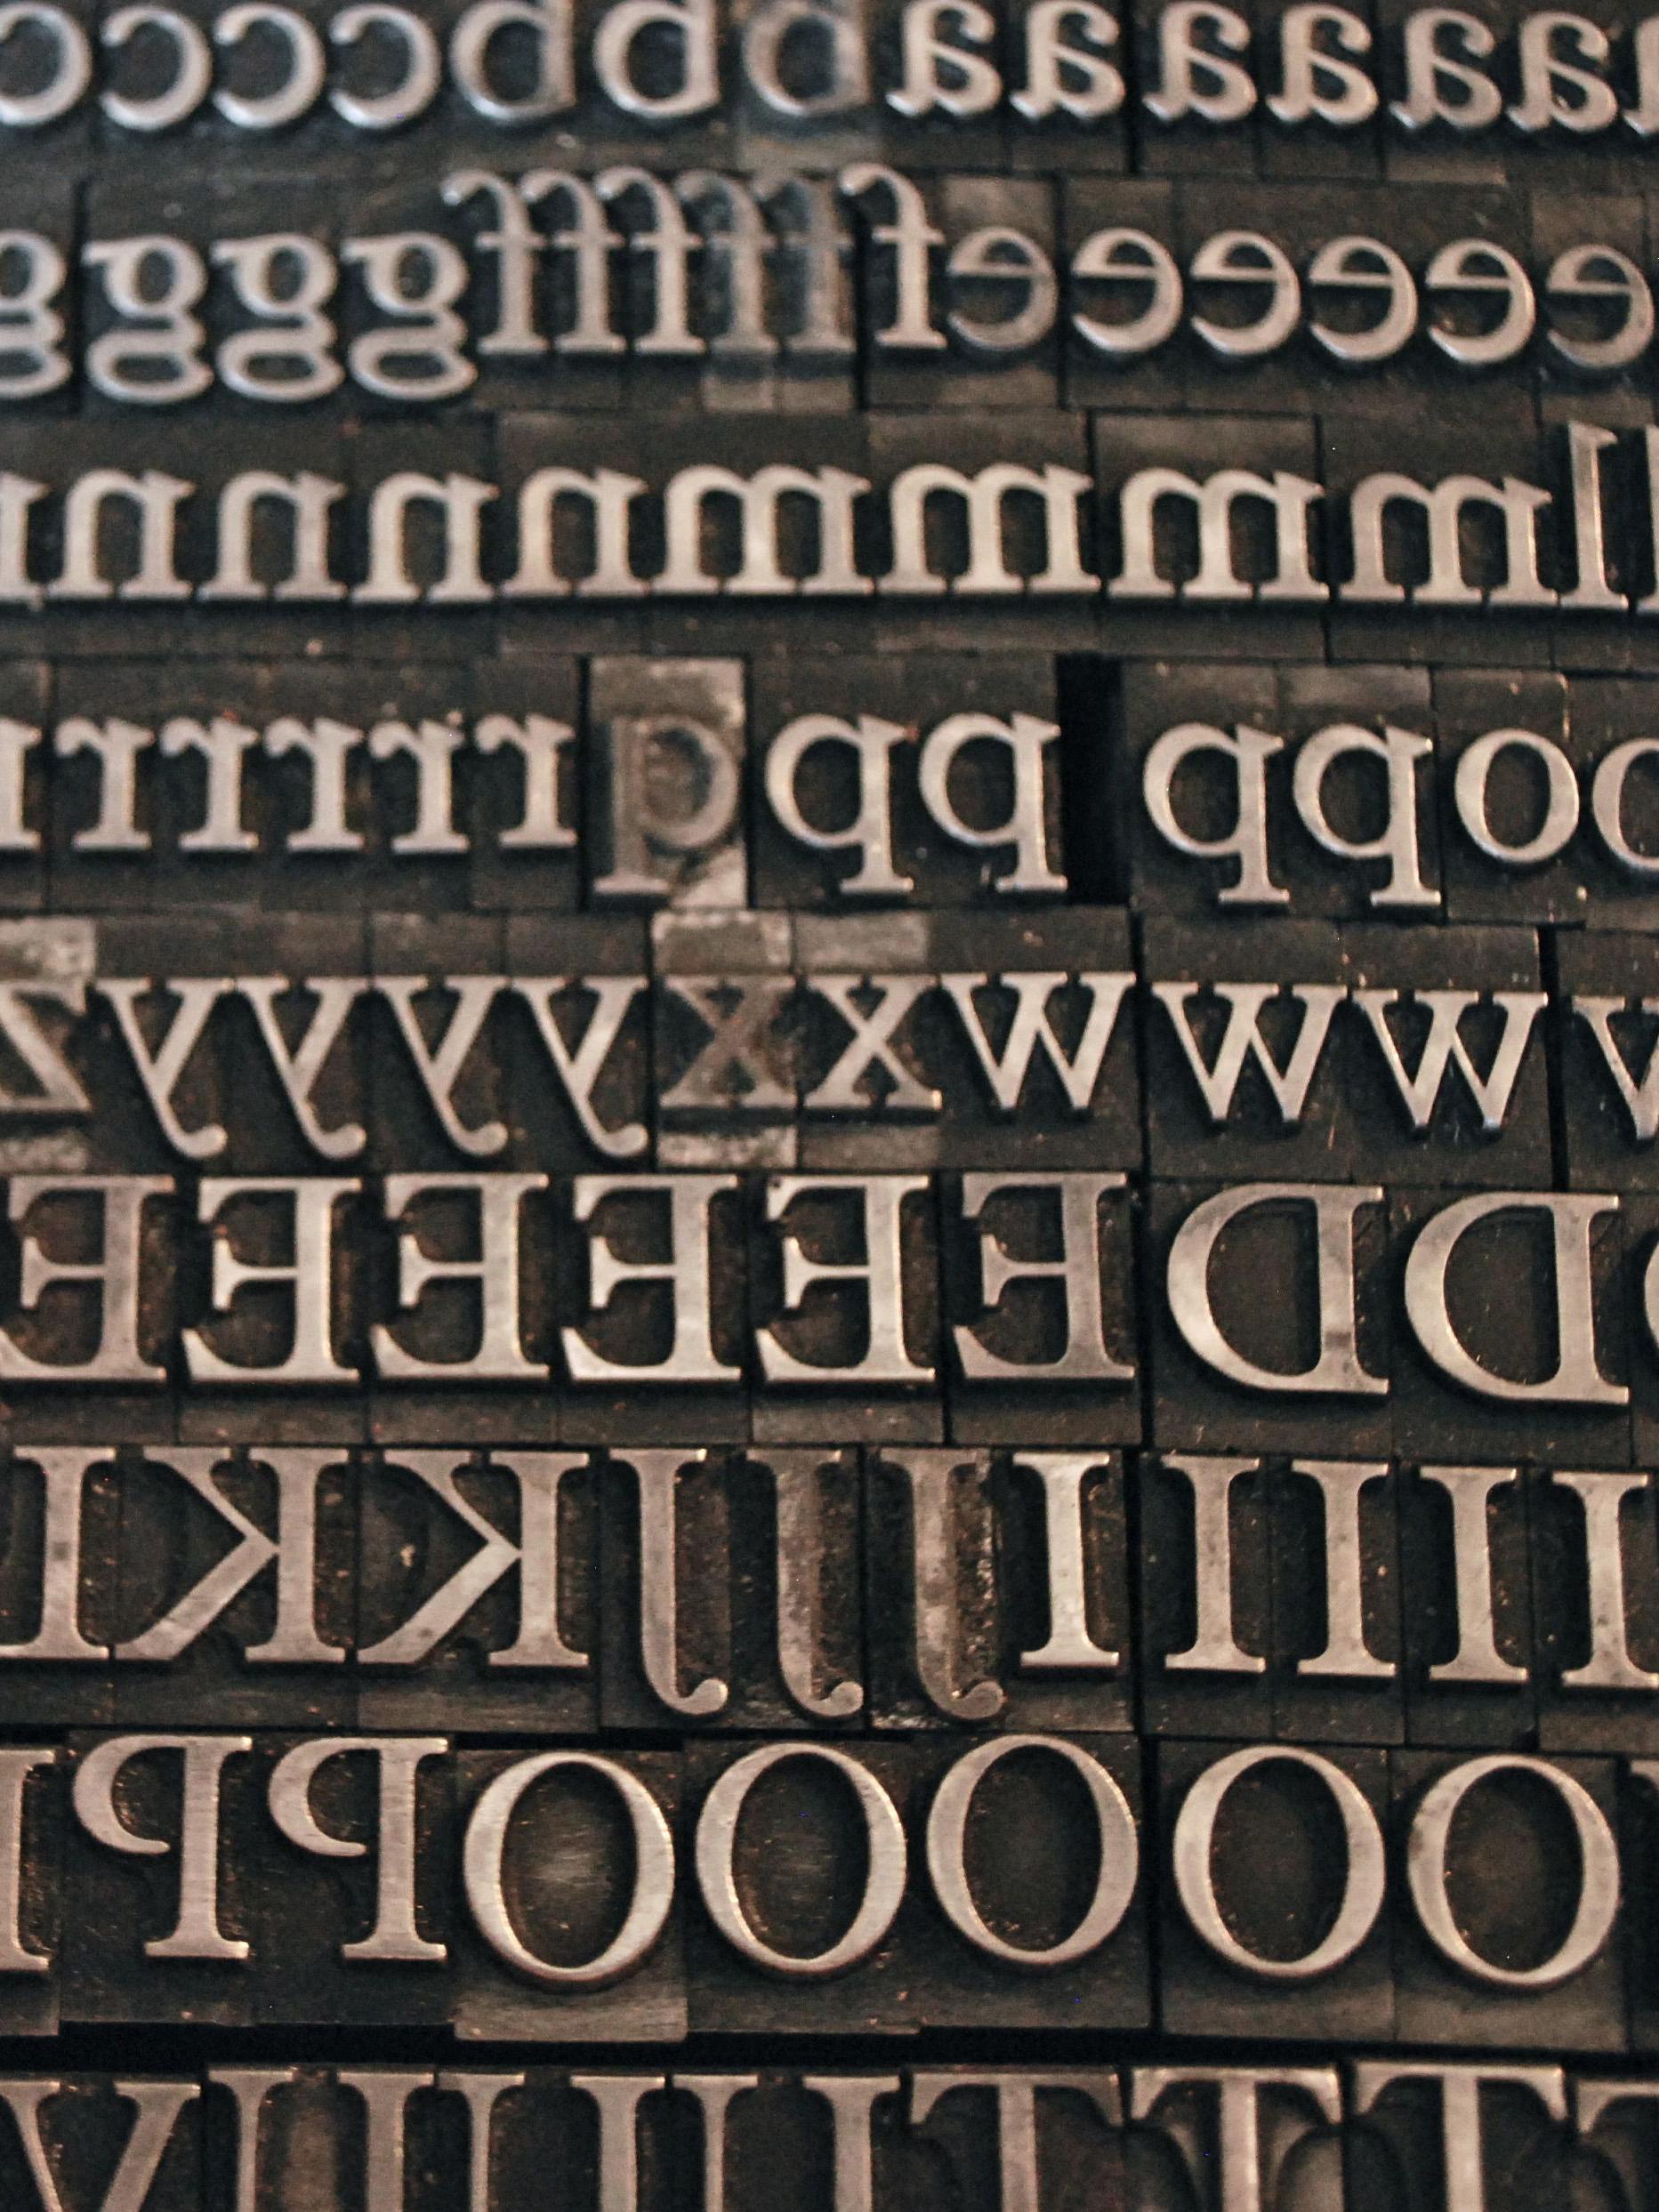 Plantin letterpress type